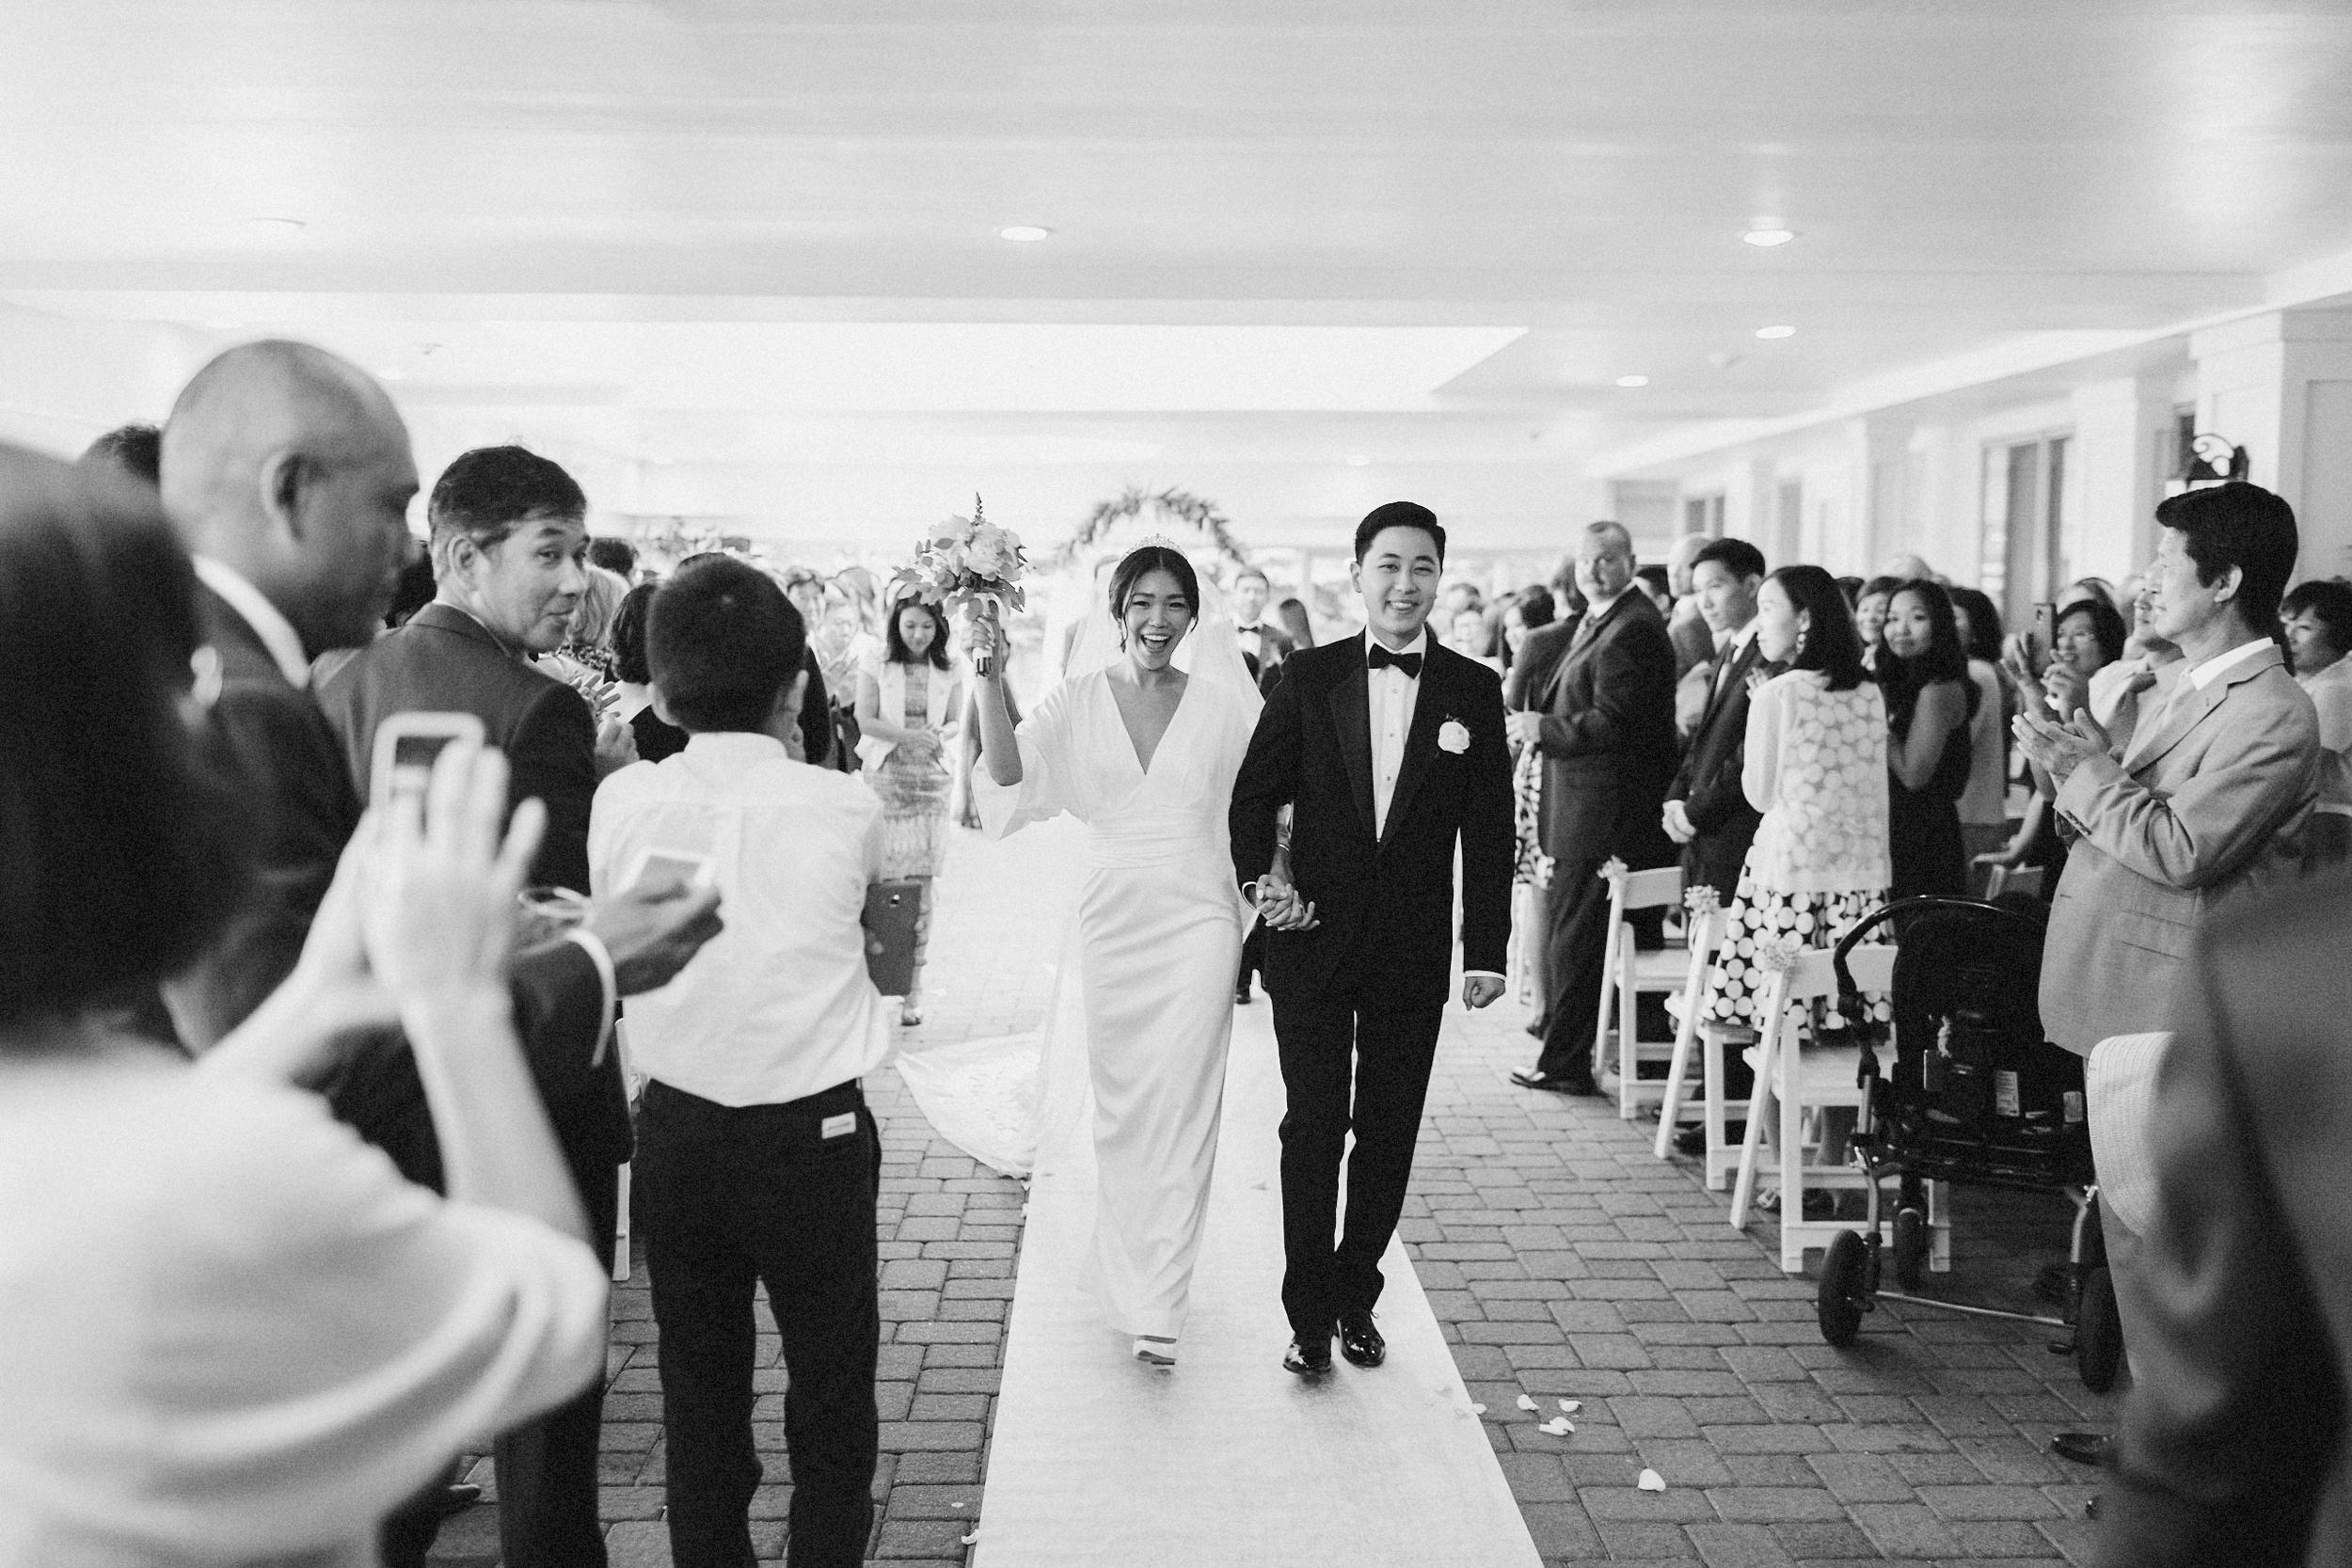 JEAN-ARNOLD-WEDDING-0358.jpg